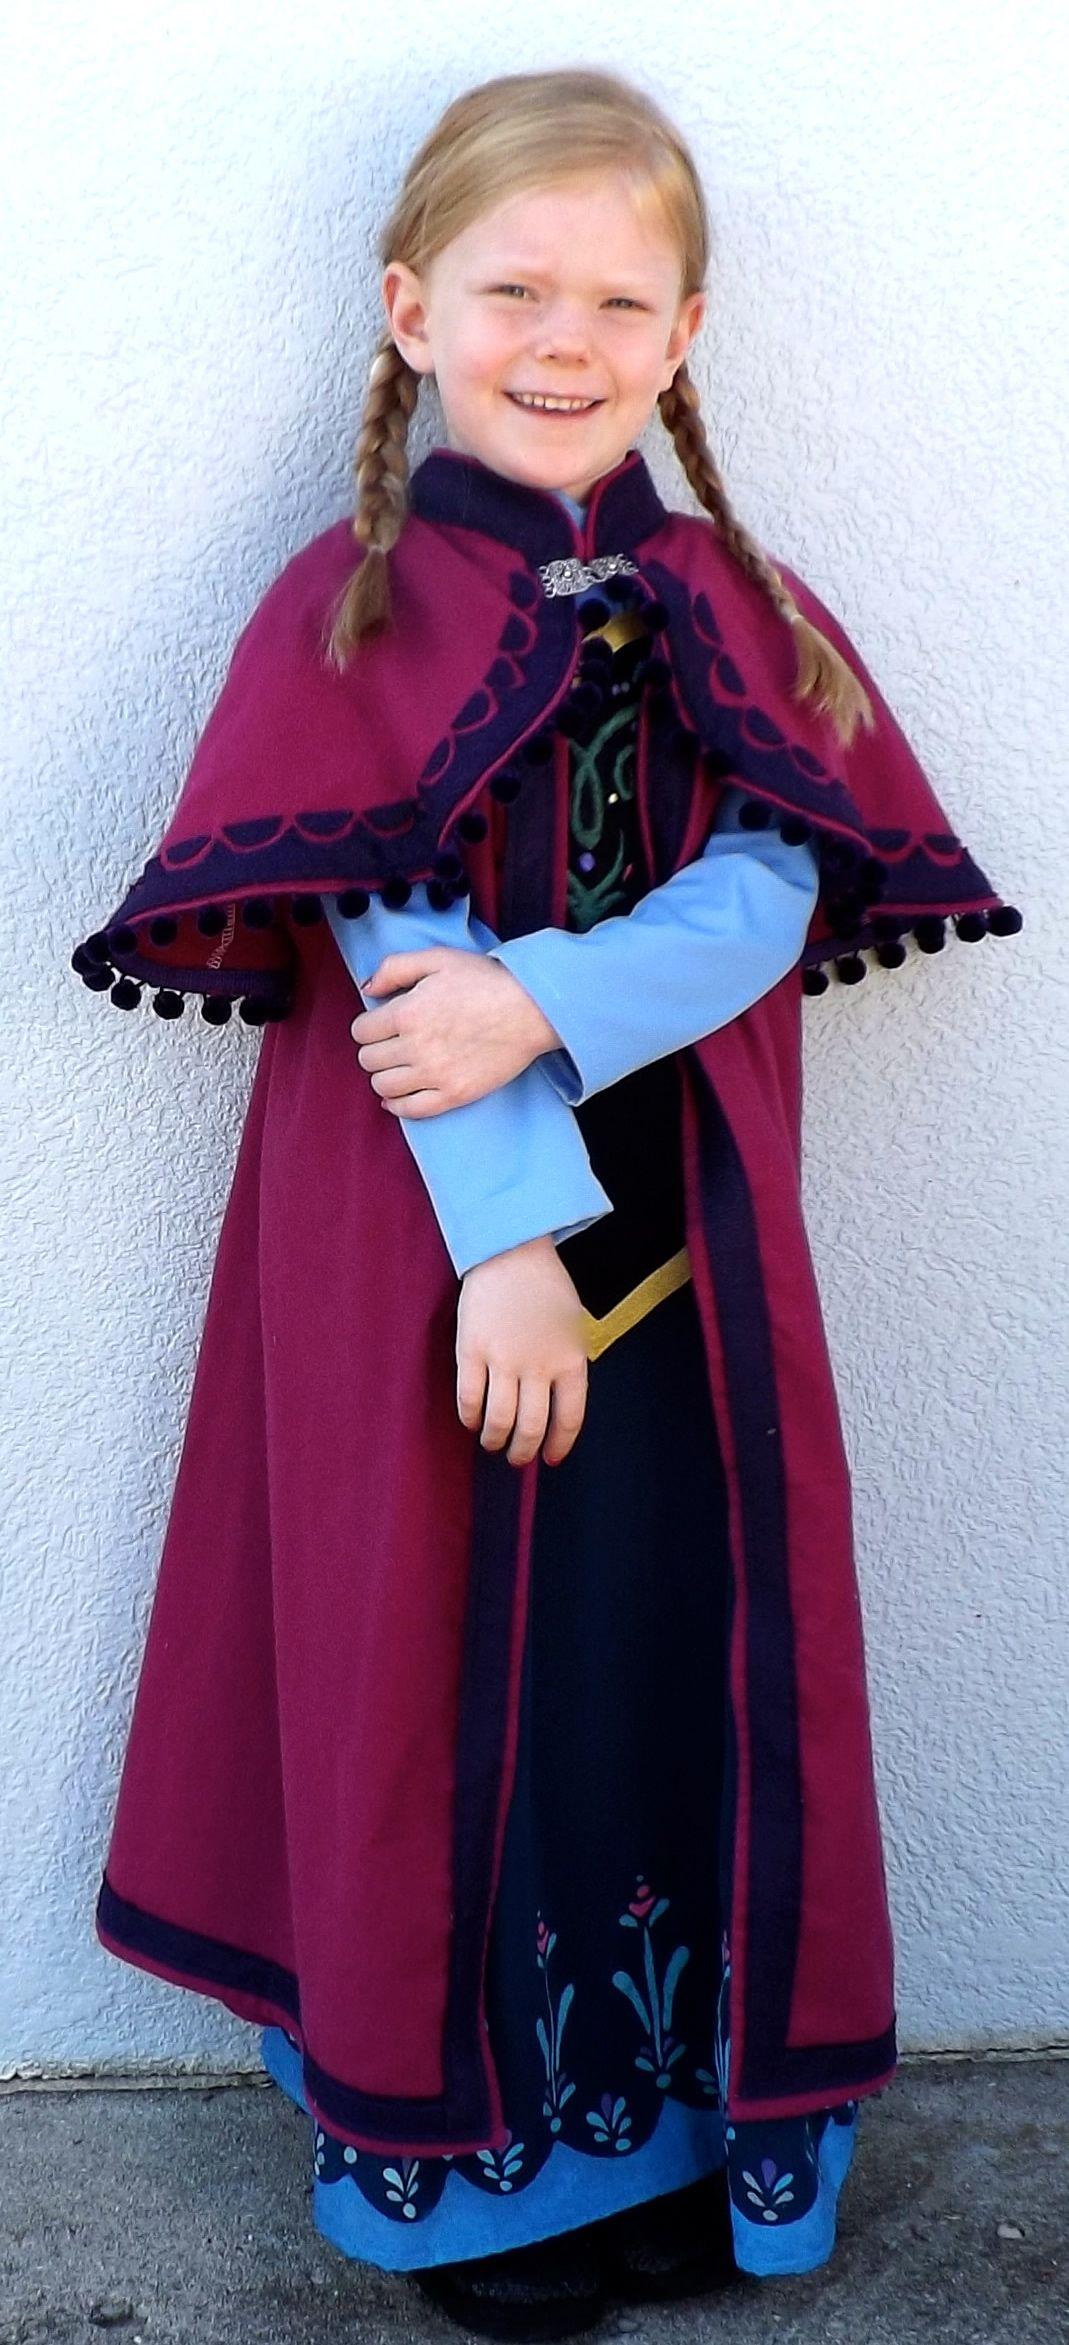 Disney Princess Anna Costume Pattern Coming Soon On Joy2sew